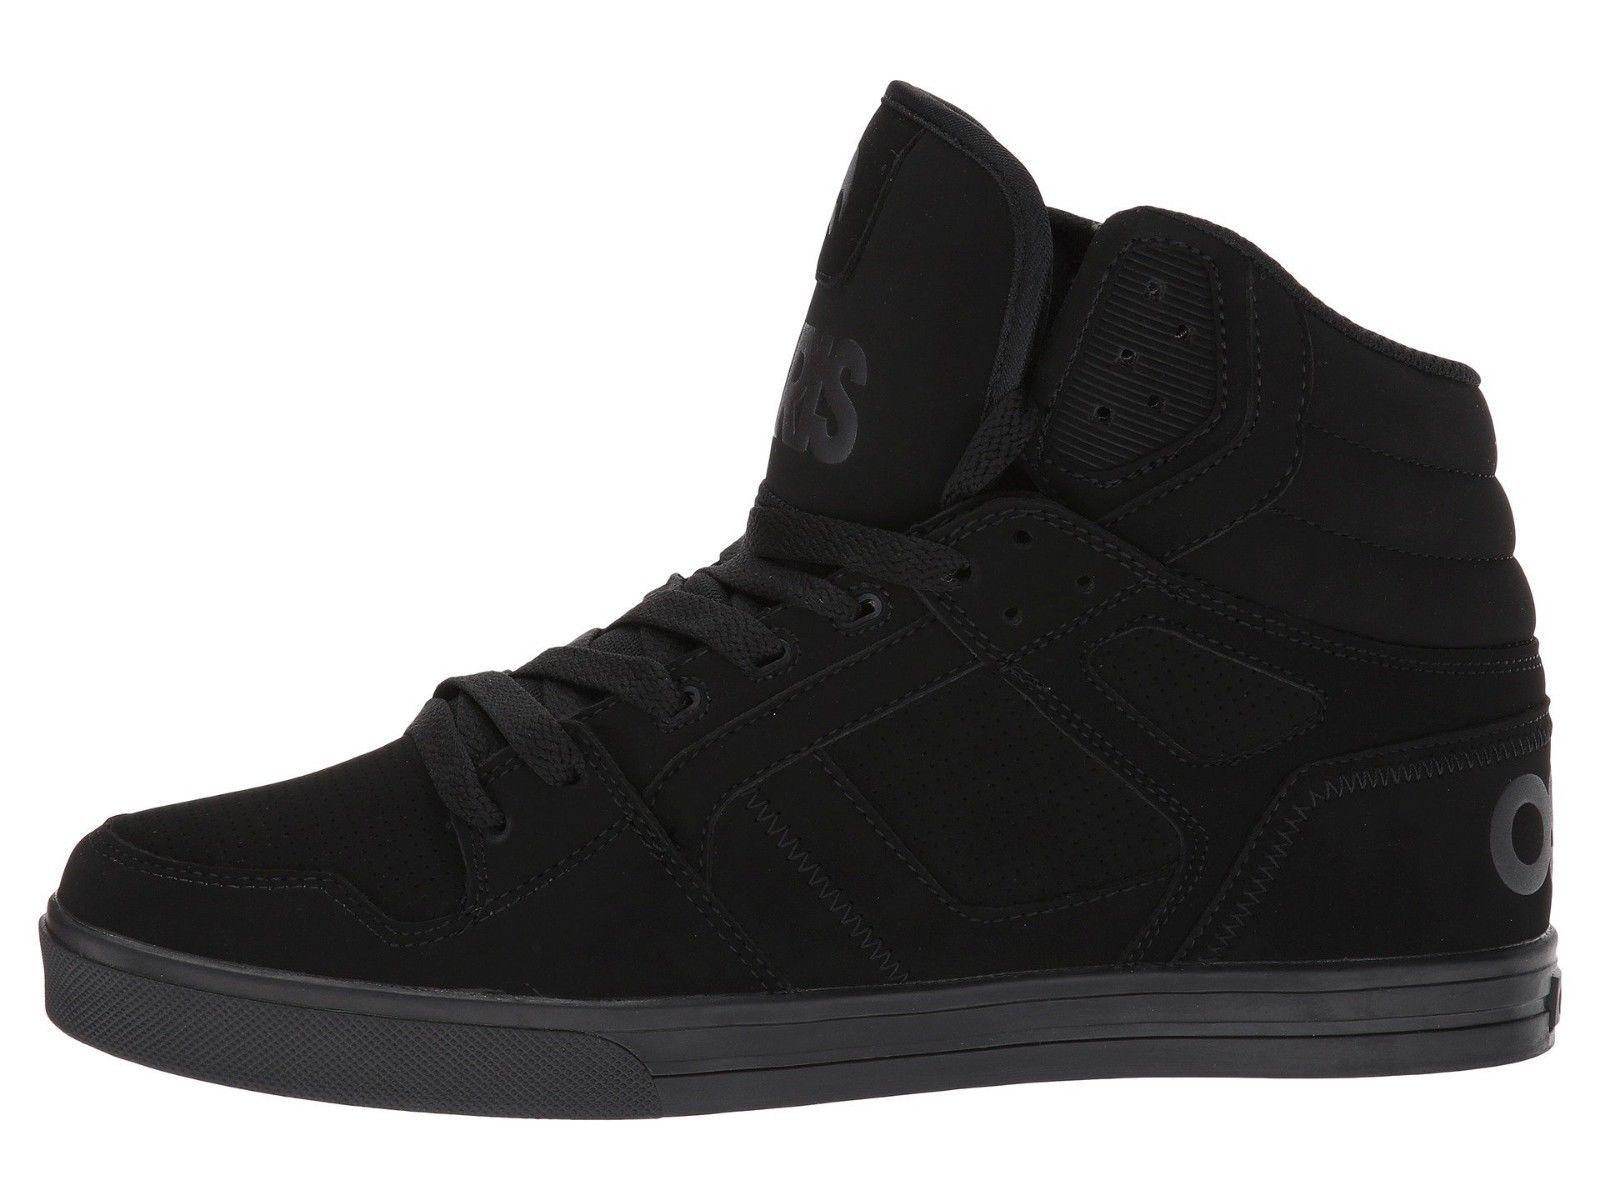 24cce95fef66 Mens Osiris Clone Skateboarding Shoes Nib and 50 similar items